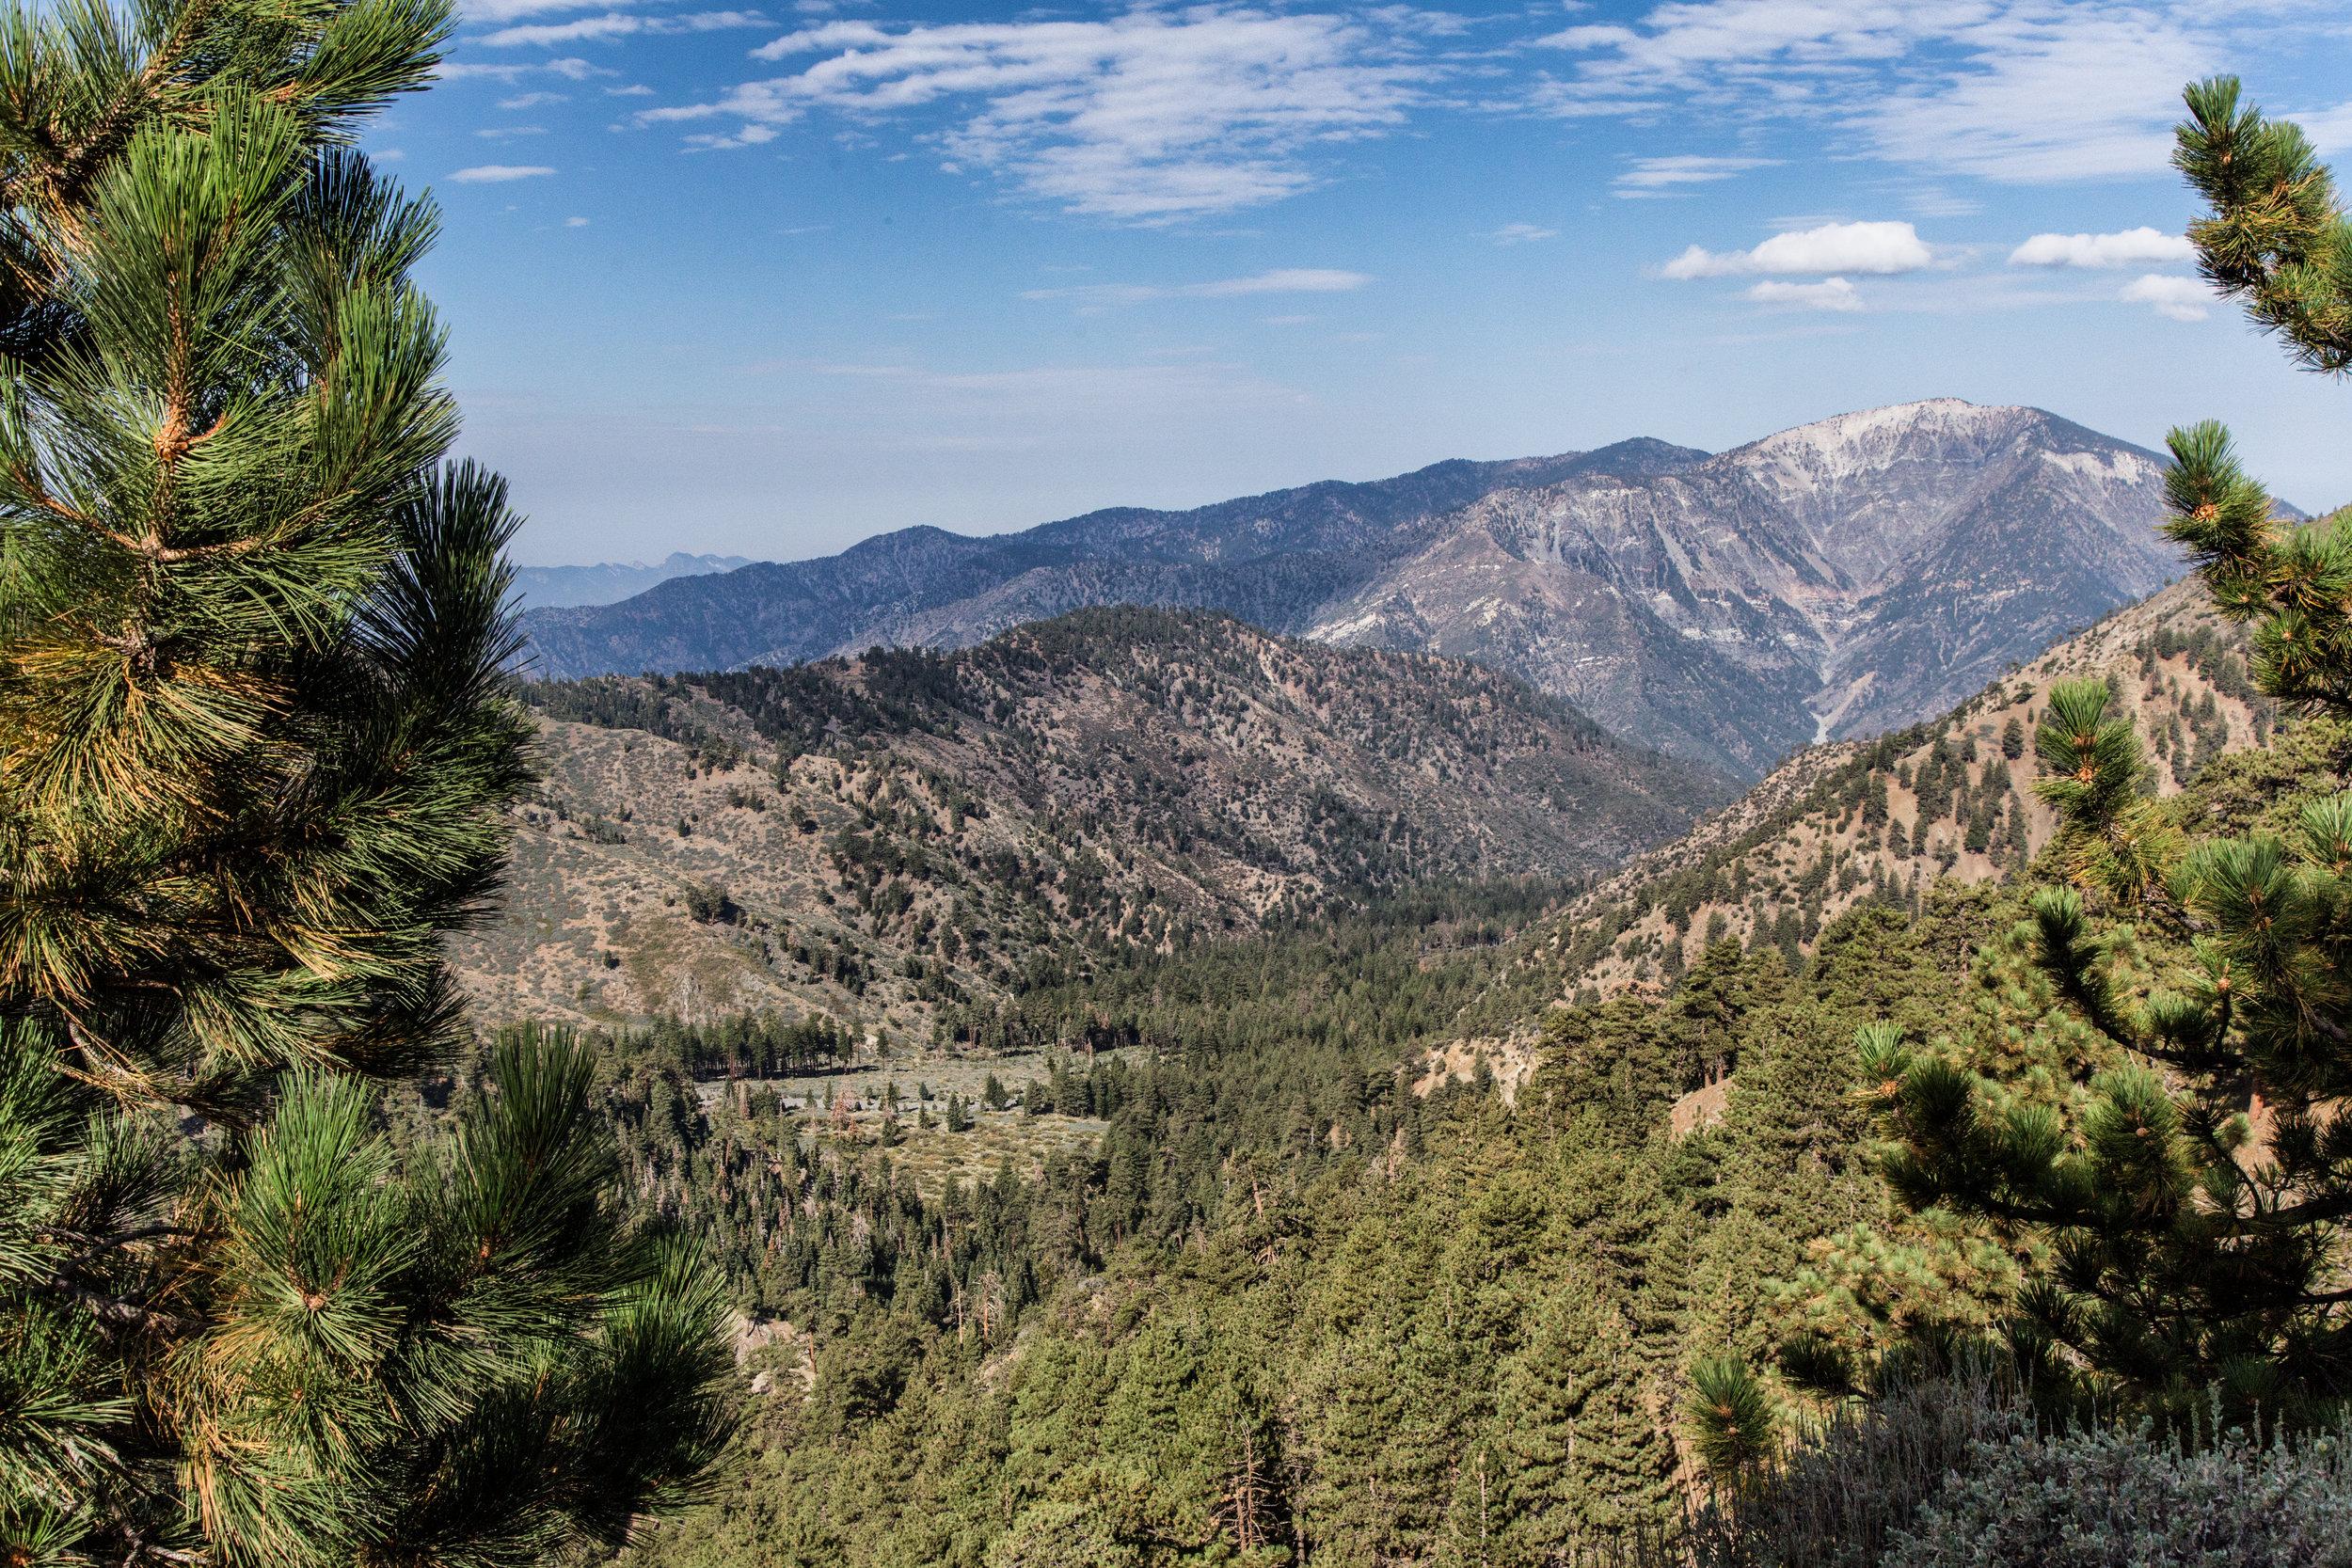 Mount San Antonio and the Sheep Mountain Wilderness.